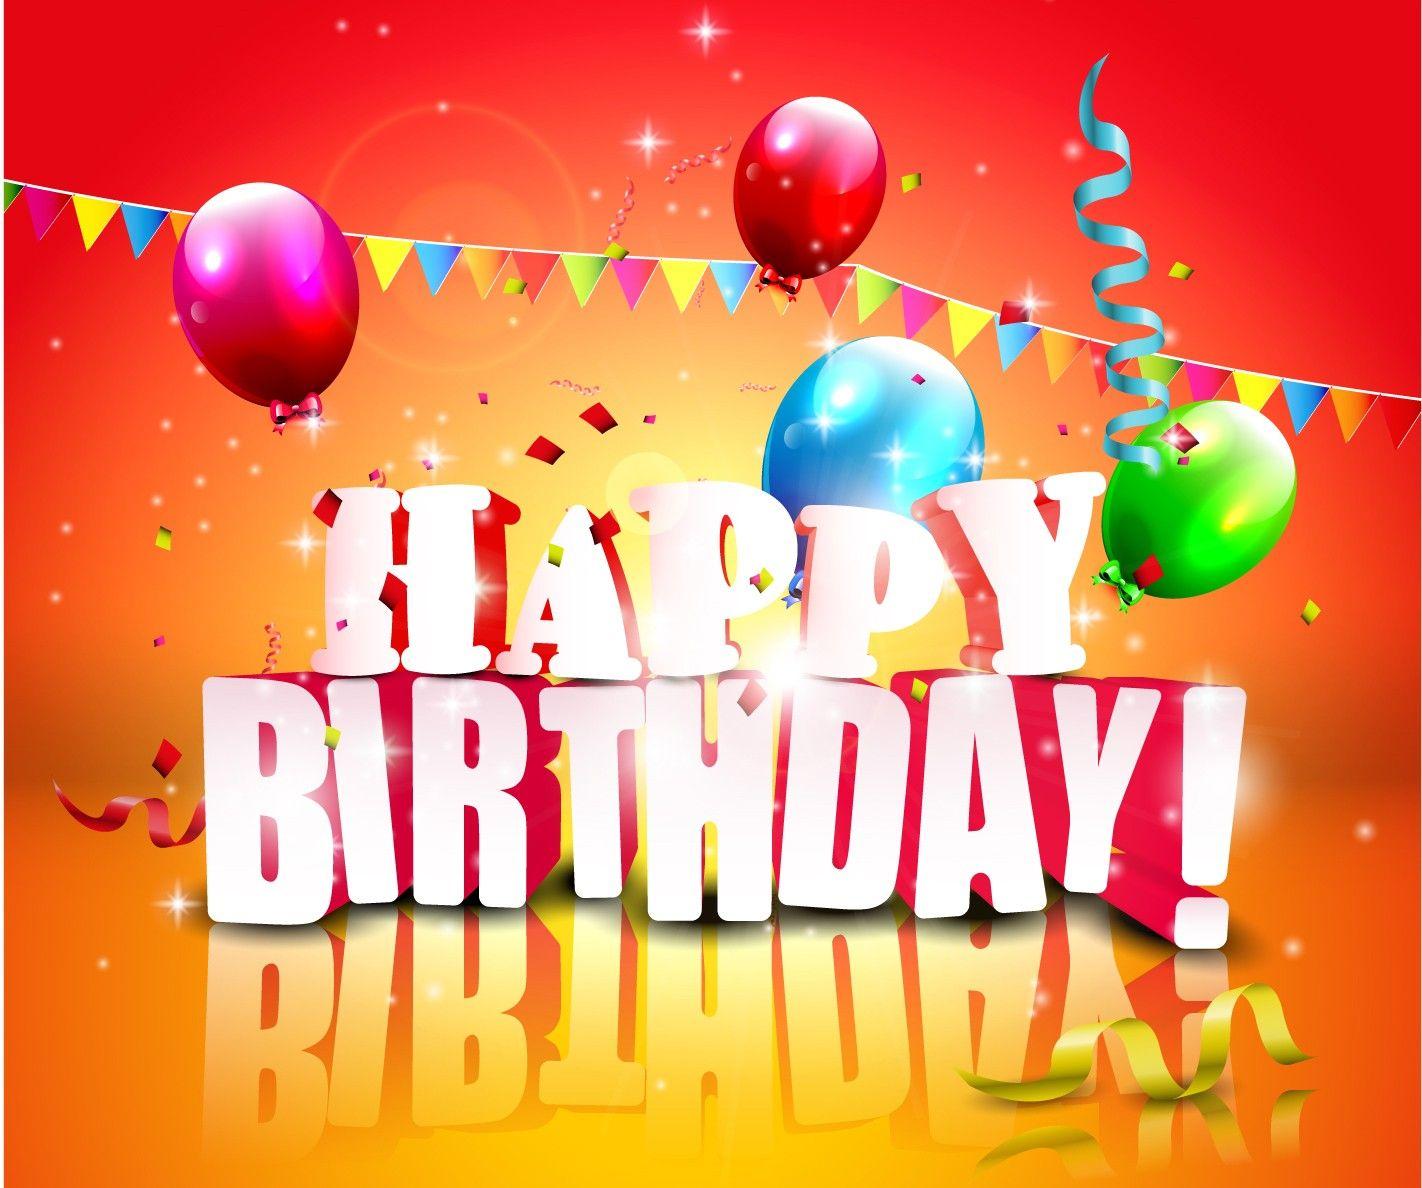 Bday Card Free Birthday Greetings Free Birthday Greeting Cards Free Birthday Card